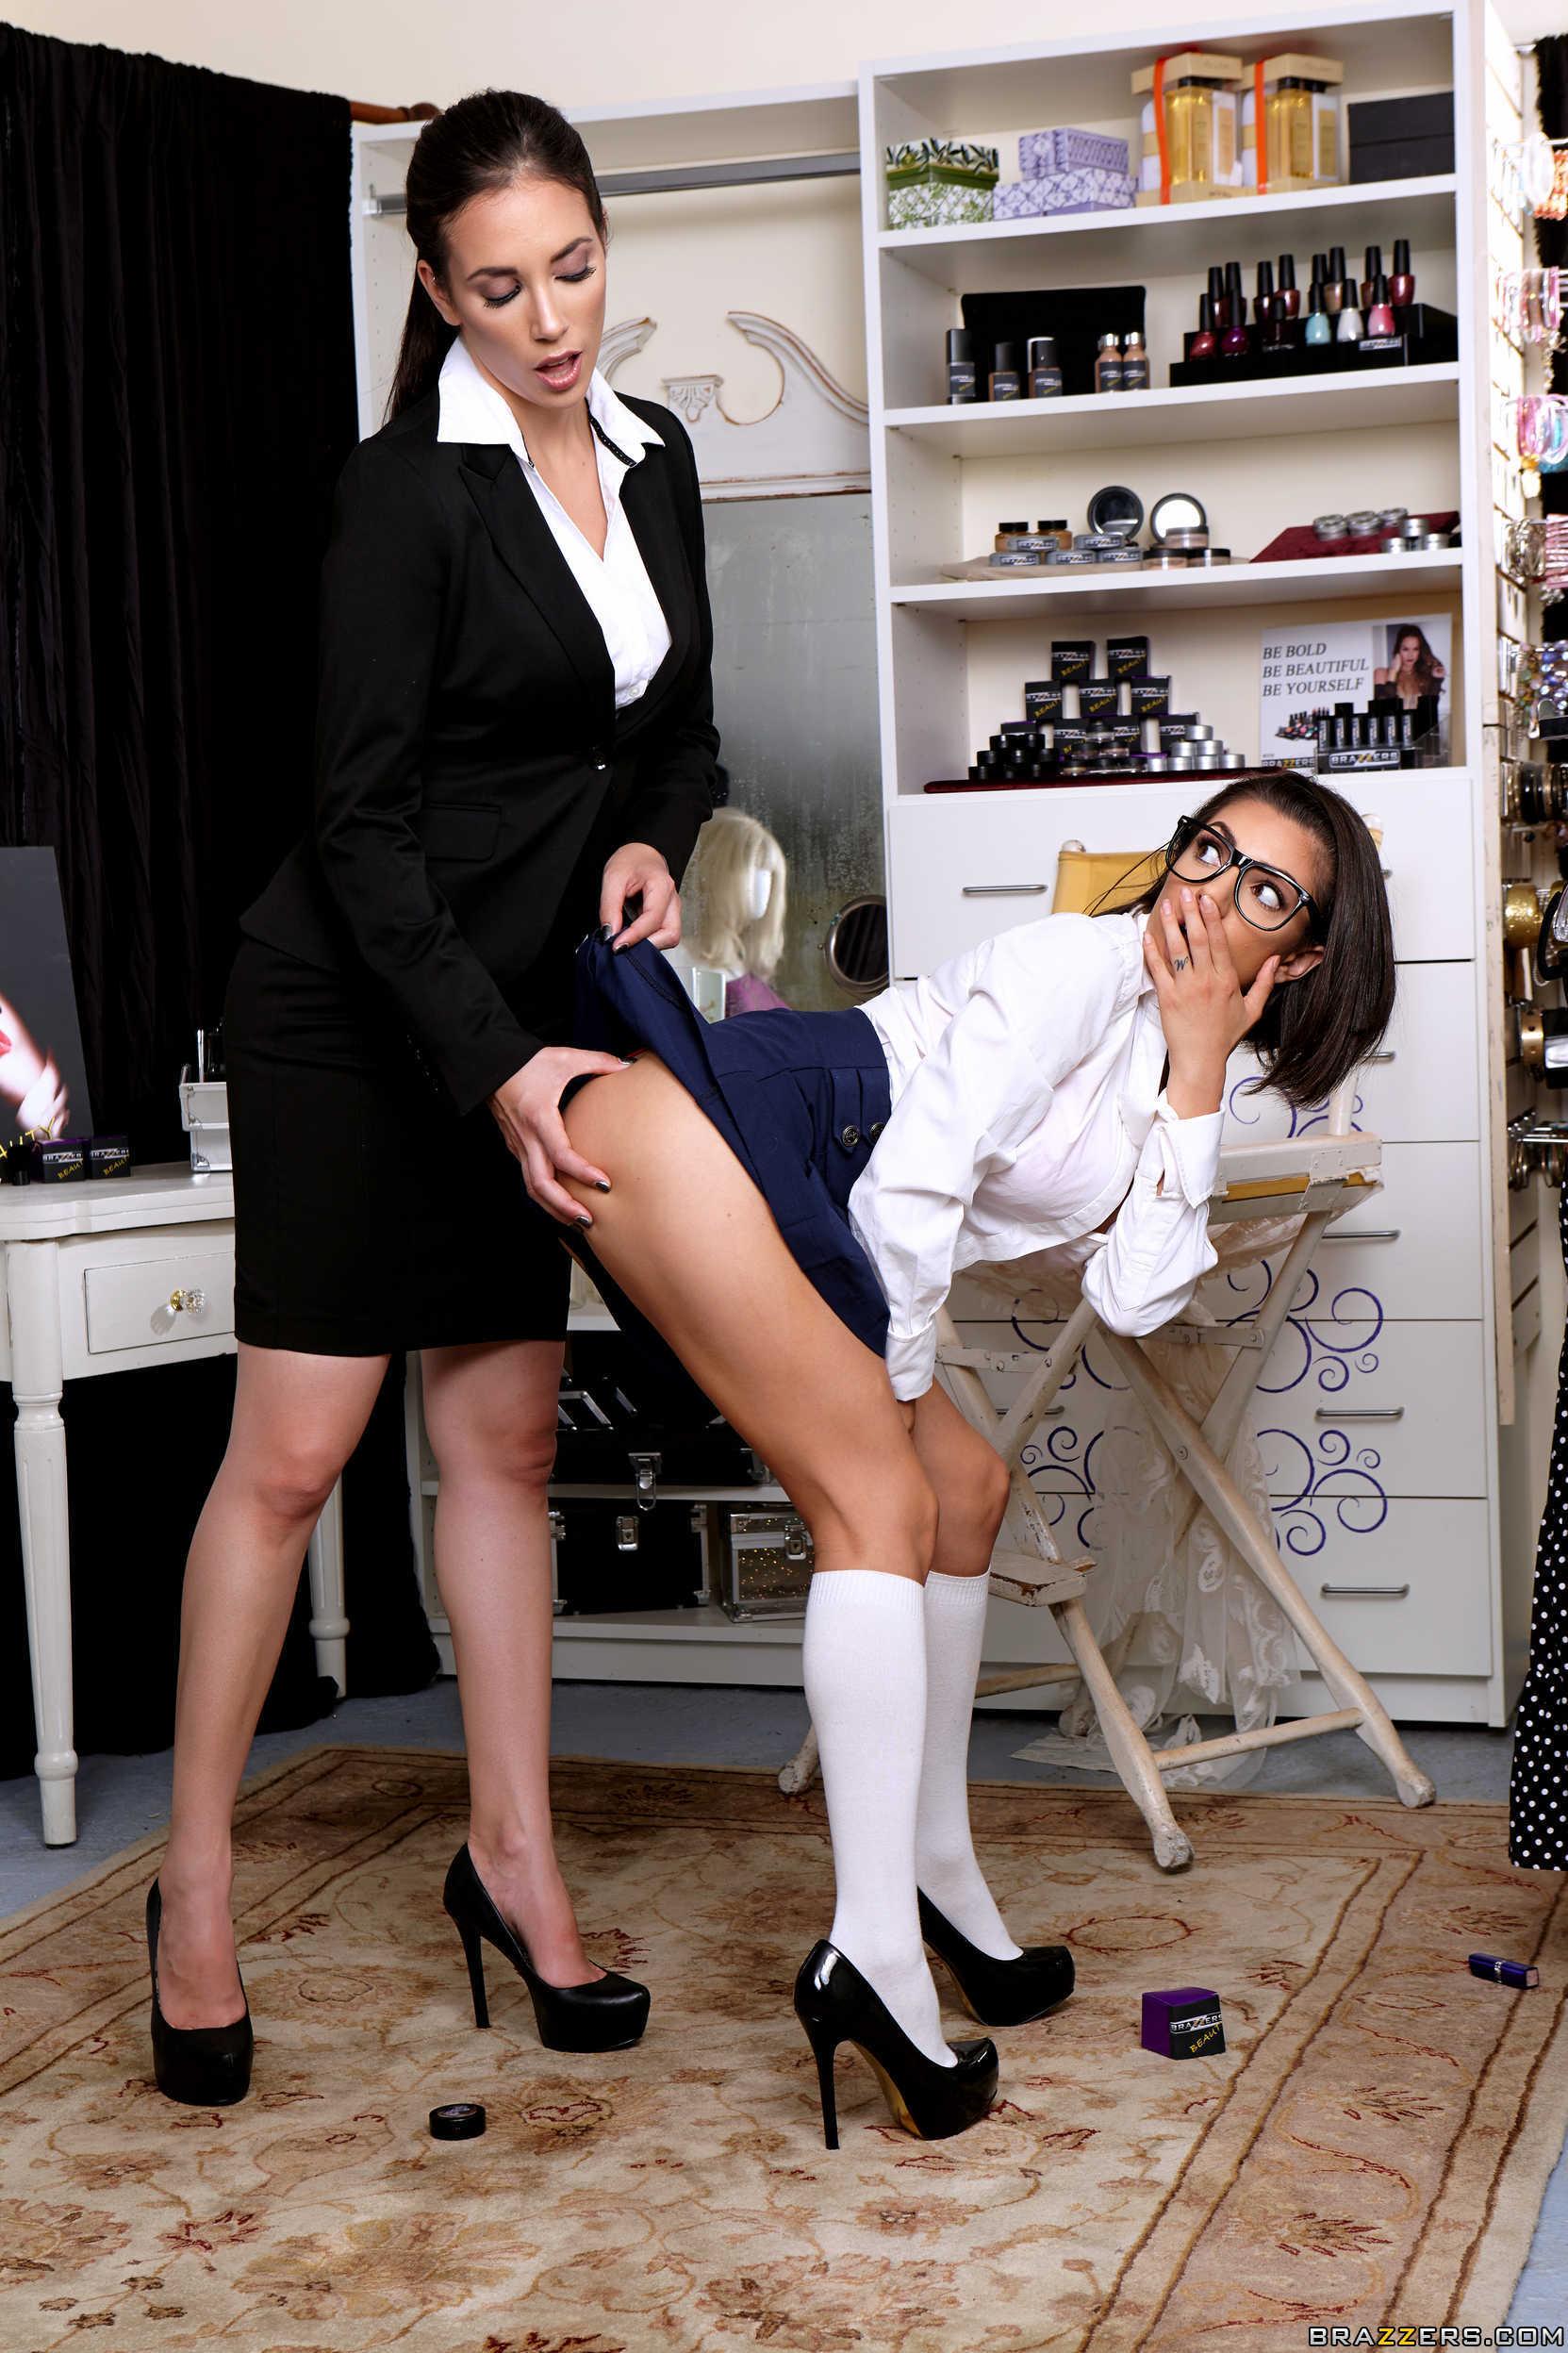 image Lesbianas azafratas lorena amp alexa tomas rico